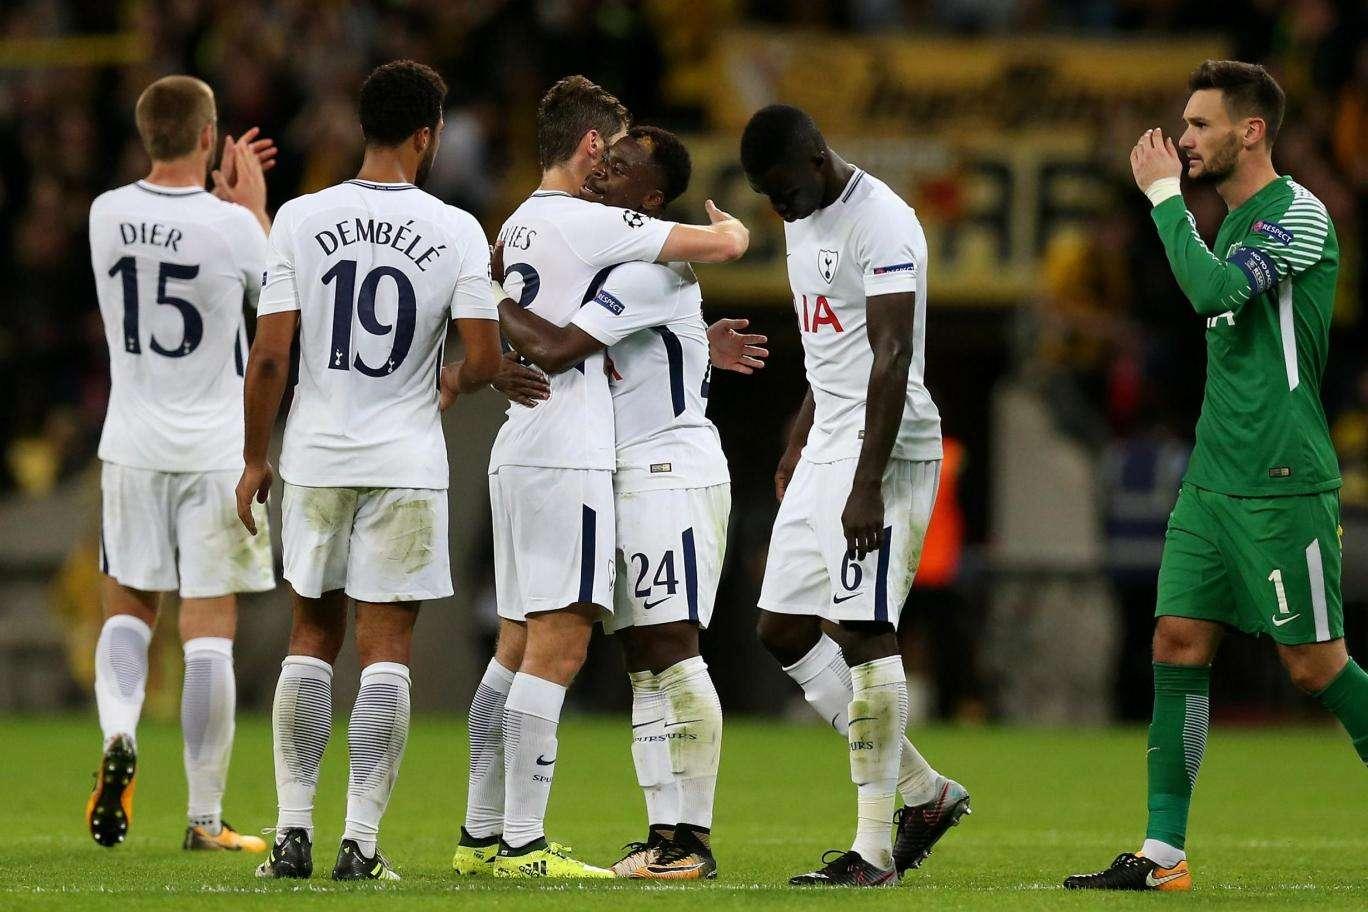 Tottenham vs Dortmund đêm nay 22/11/2017 Champions League